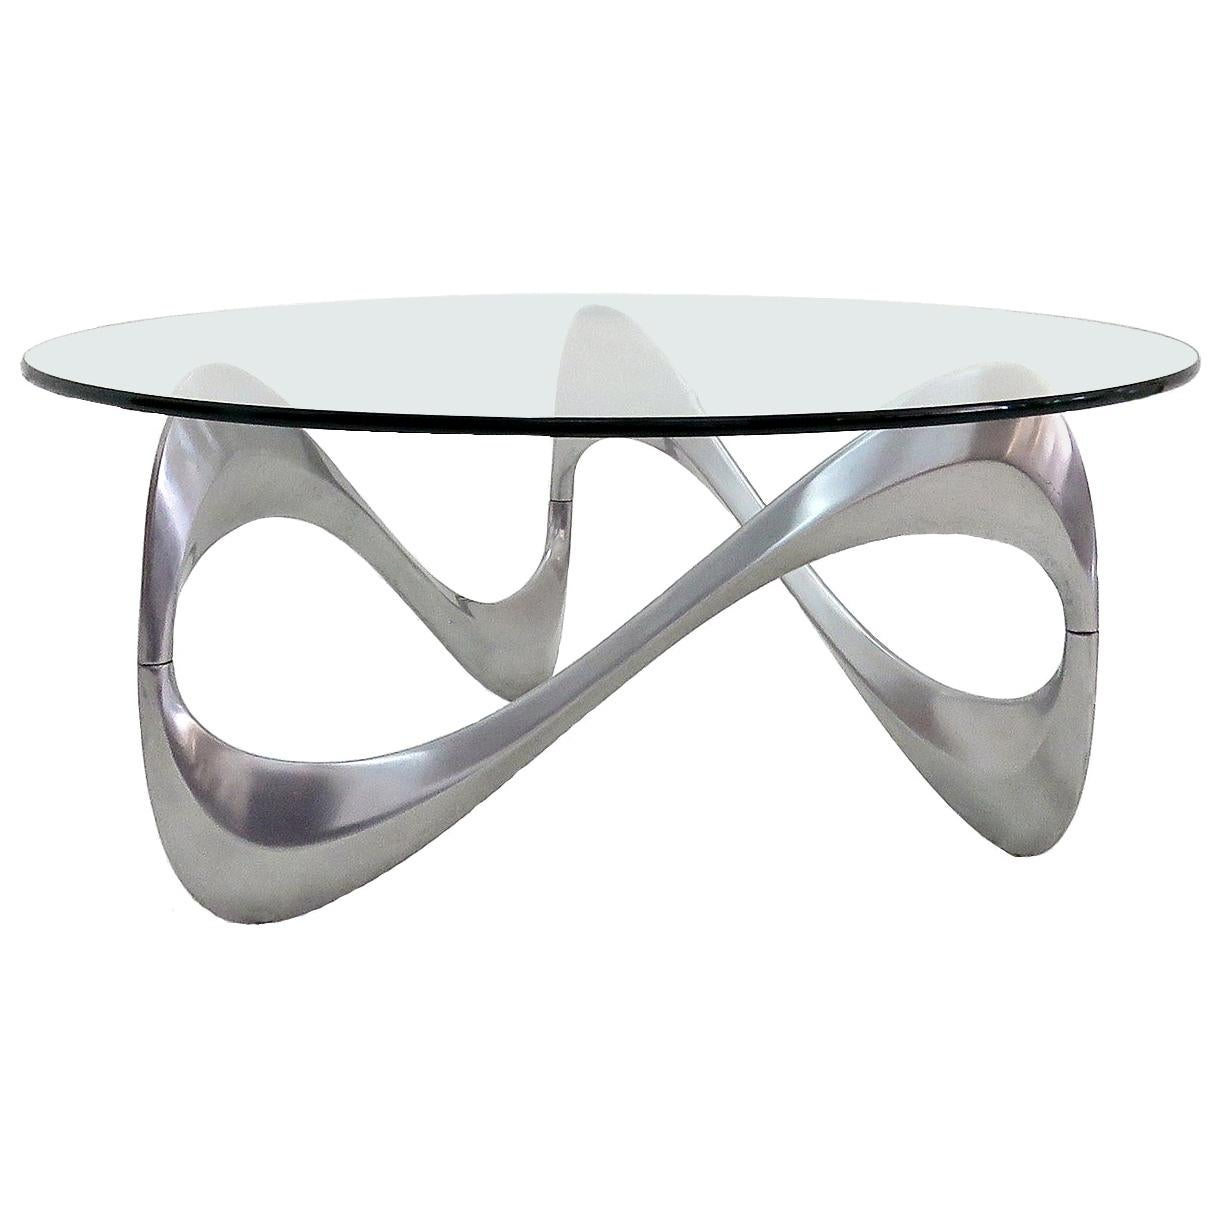 "Ronald Schmitt Coffee Table ""Schlangentisch"", 1965"